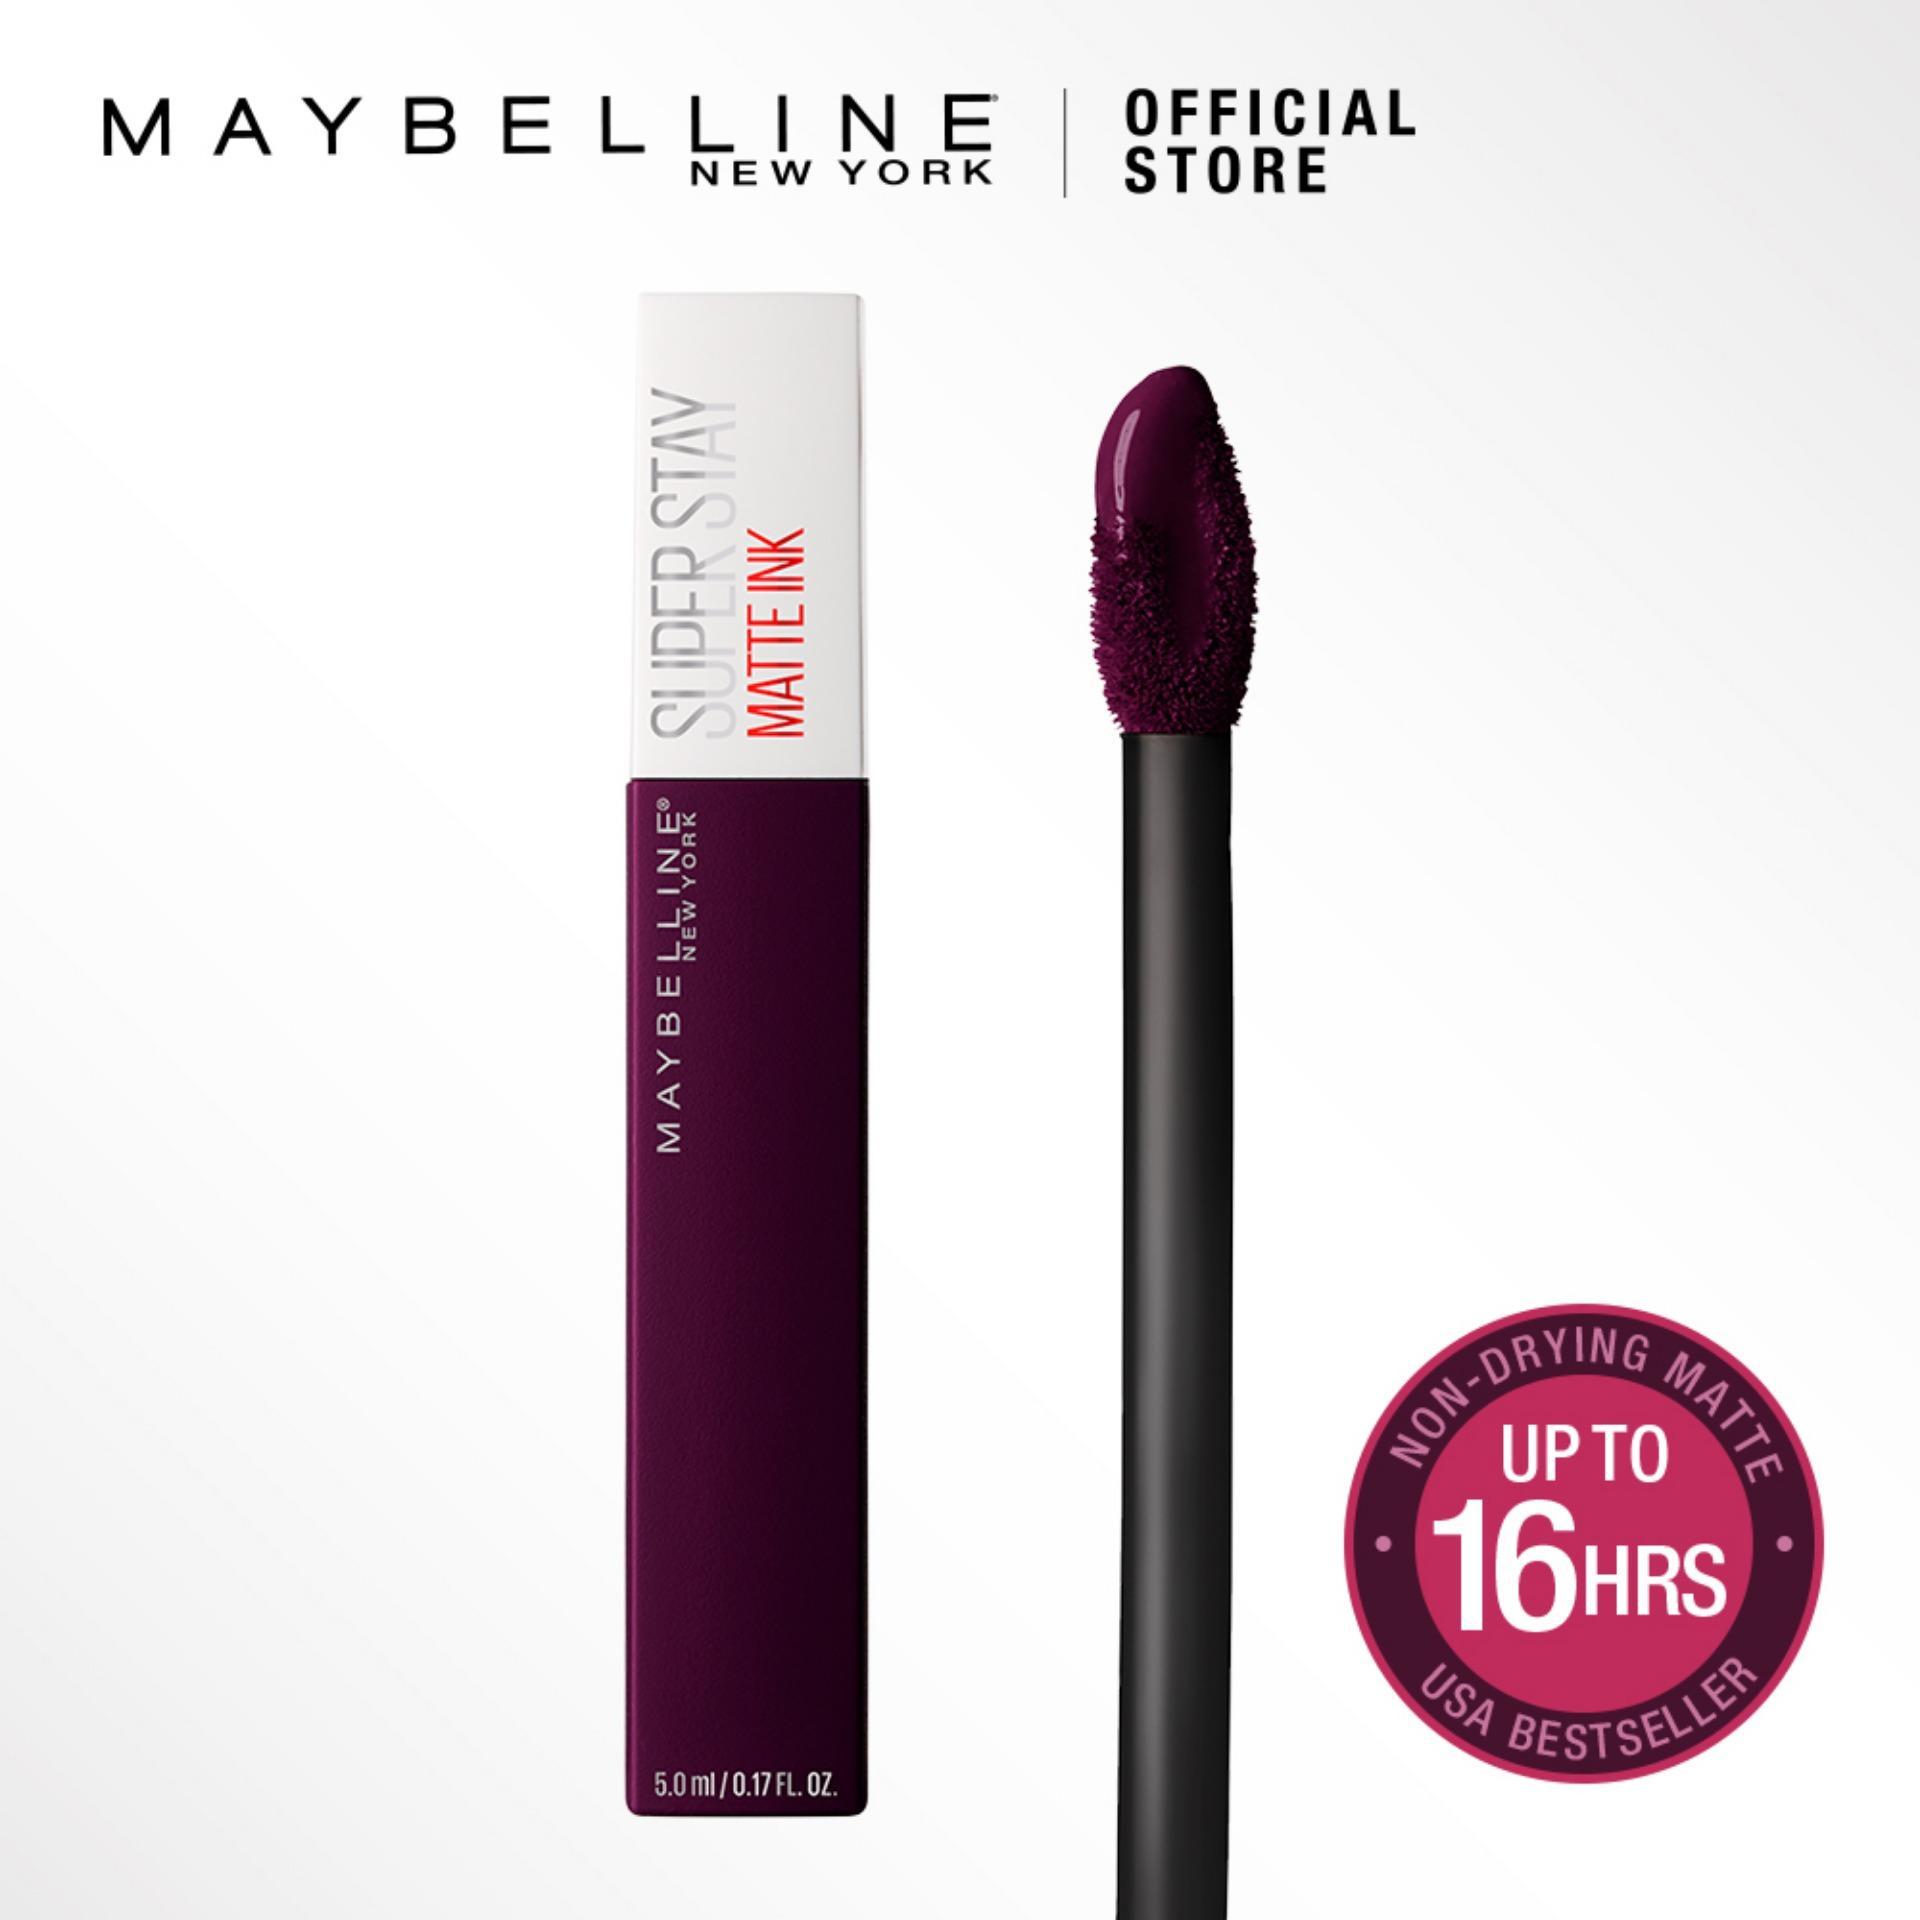 Lip Makeup Products Balm Lipsticks More Original Wardah Cream Exclusive Matte Cair Maybelline Superstay Ink Liquid Lipstick